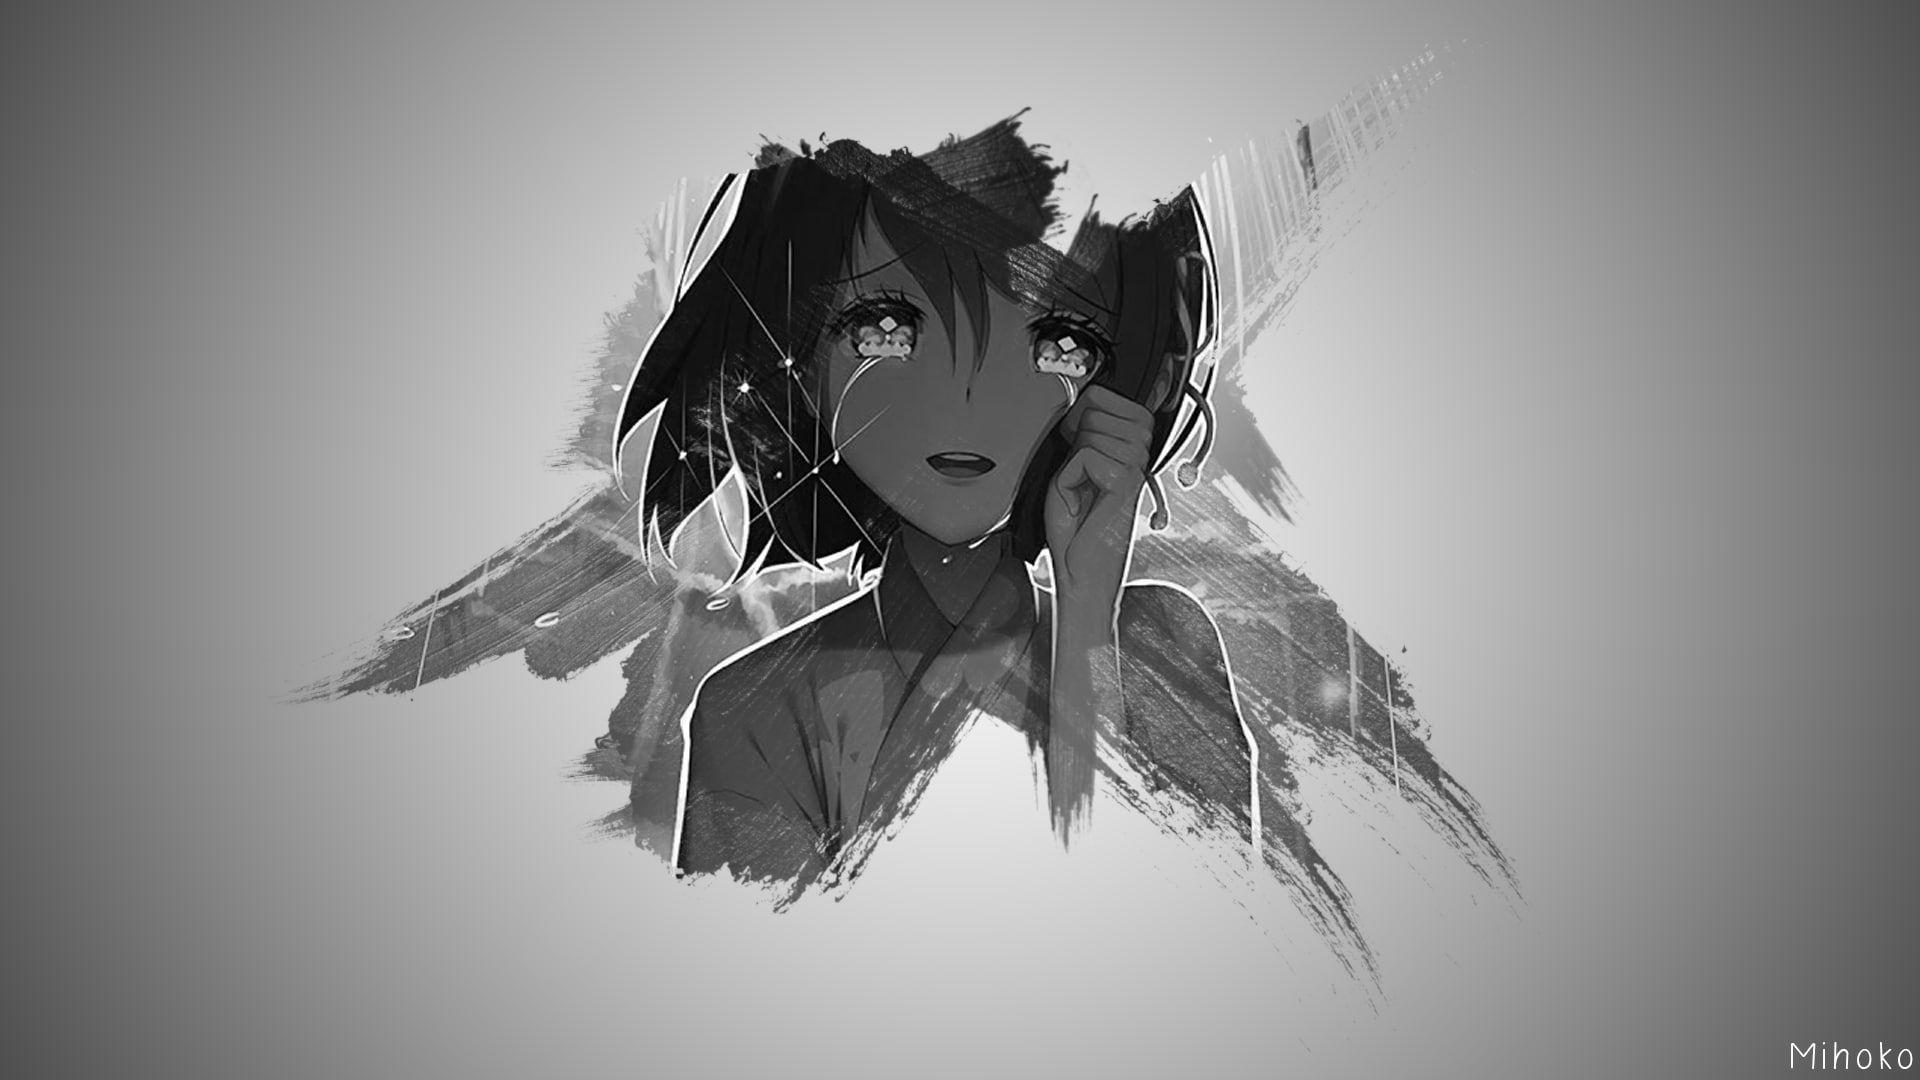 Pin On Hh Anime sad face wallpaper